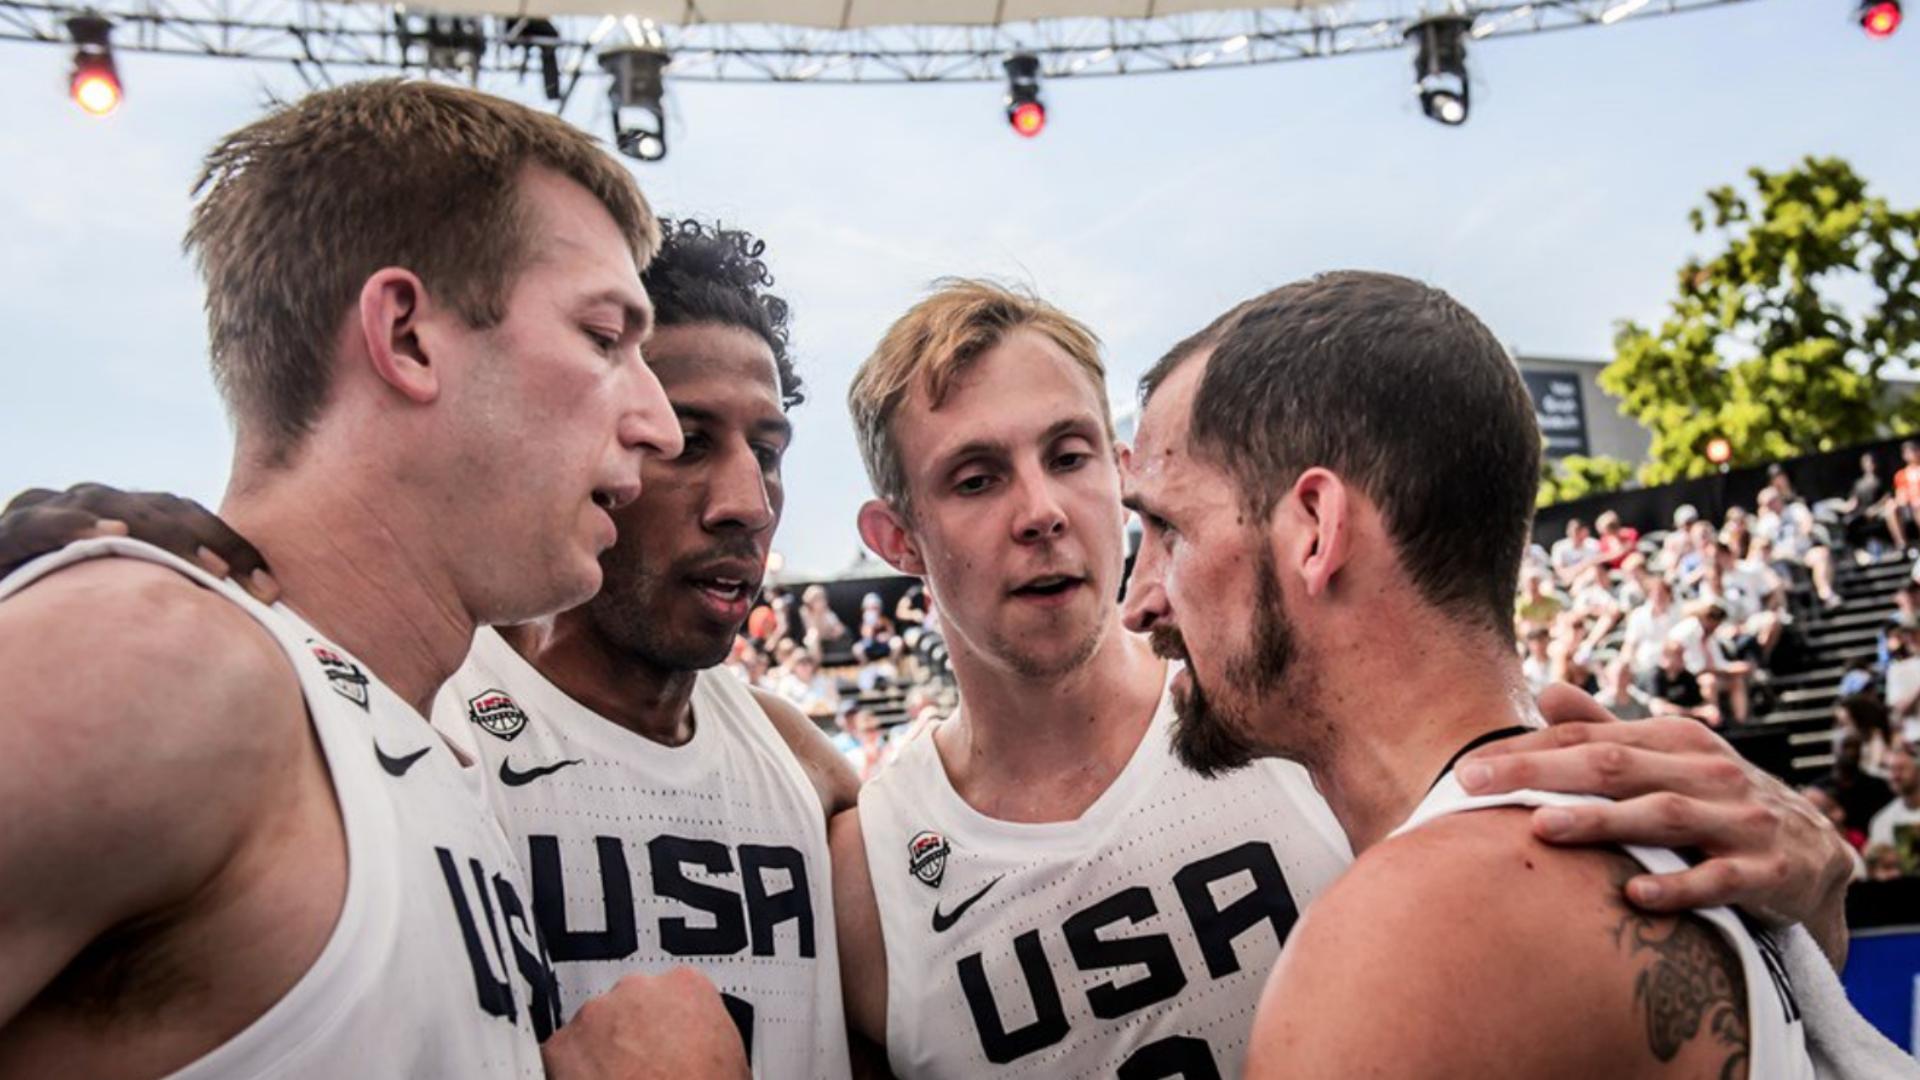 USA and China win FIBA titles